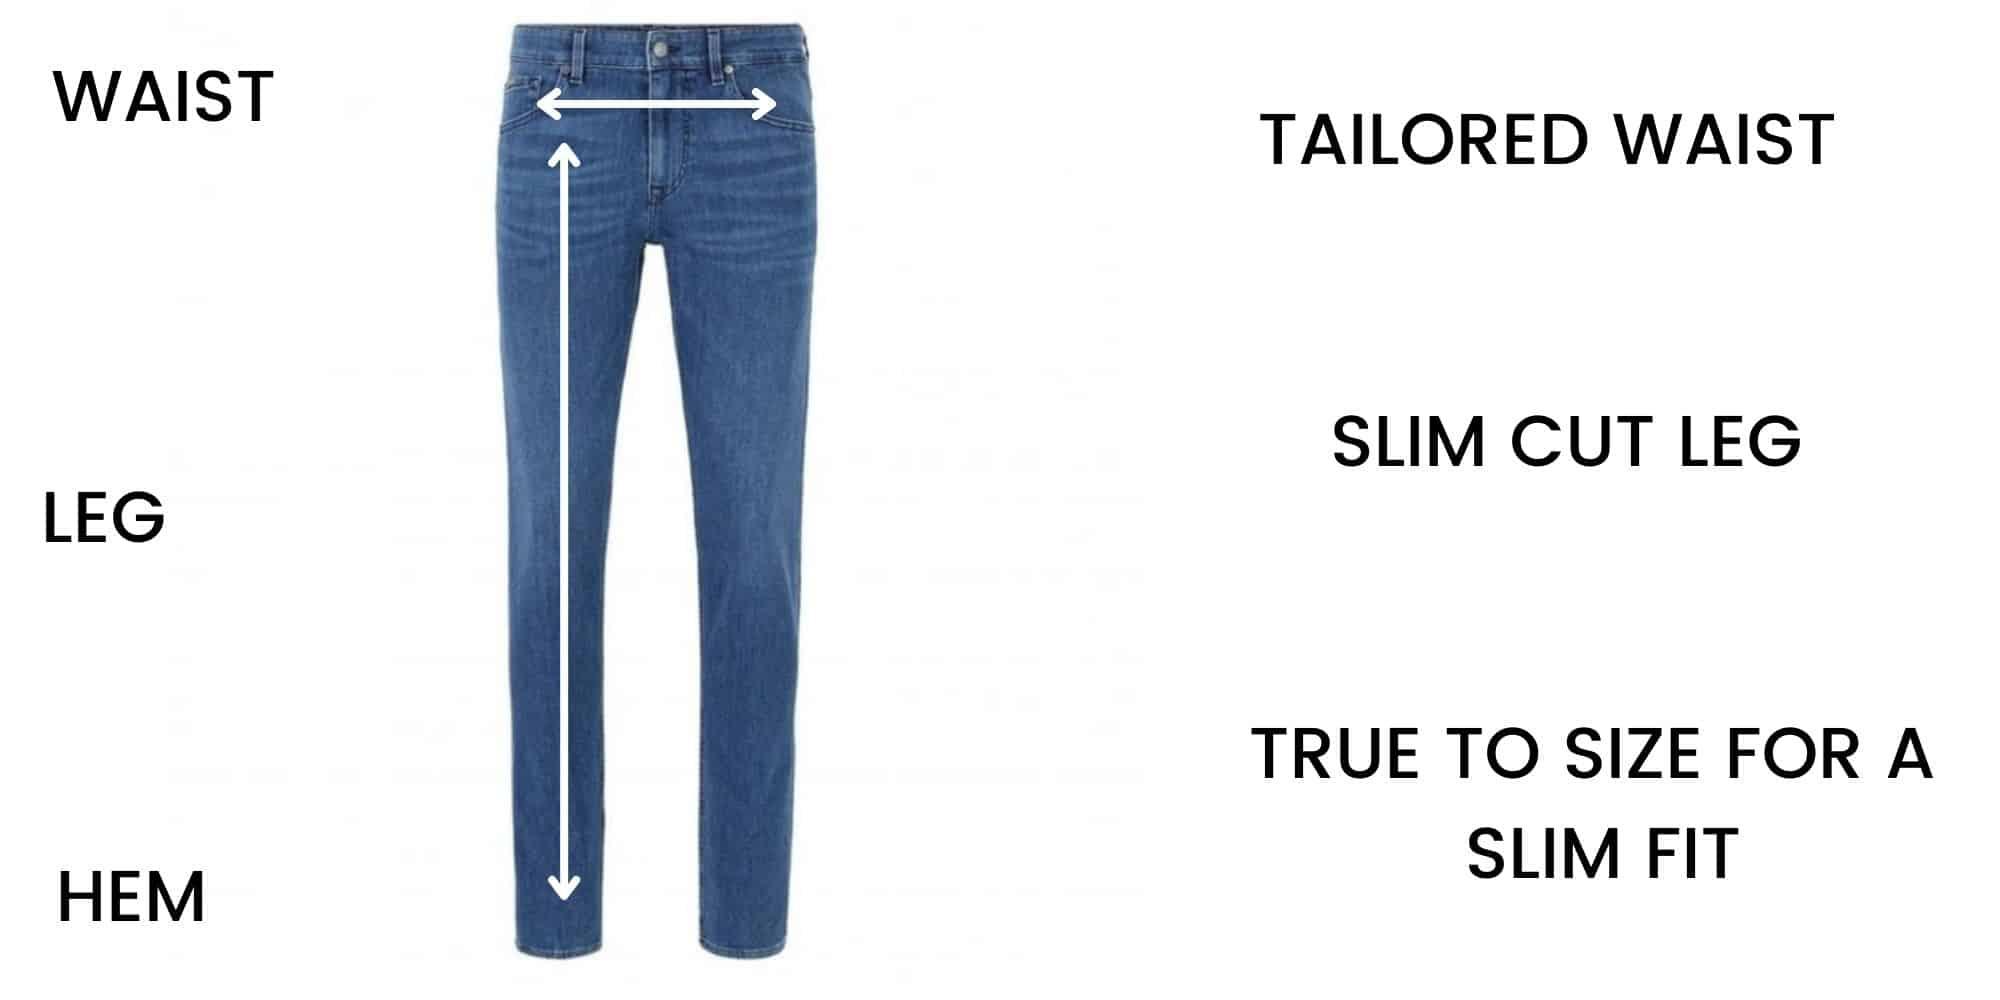 Boss Jeans Slim Fit Size Chart